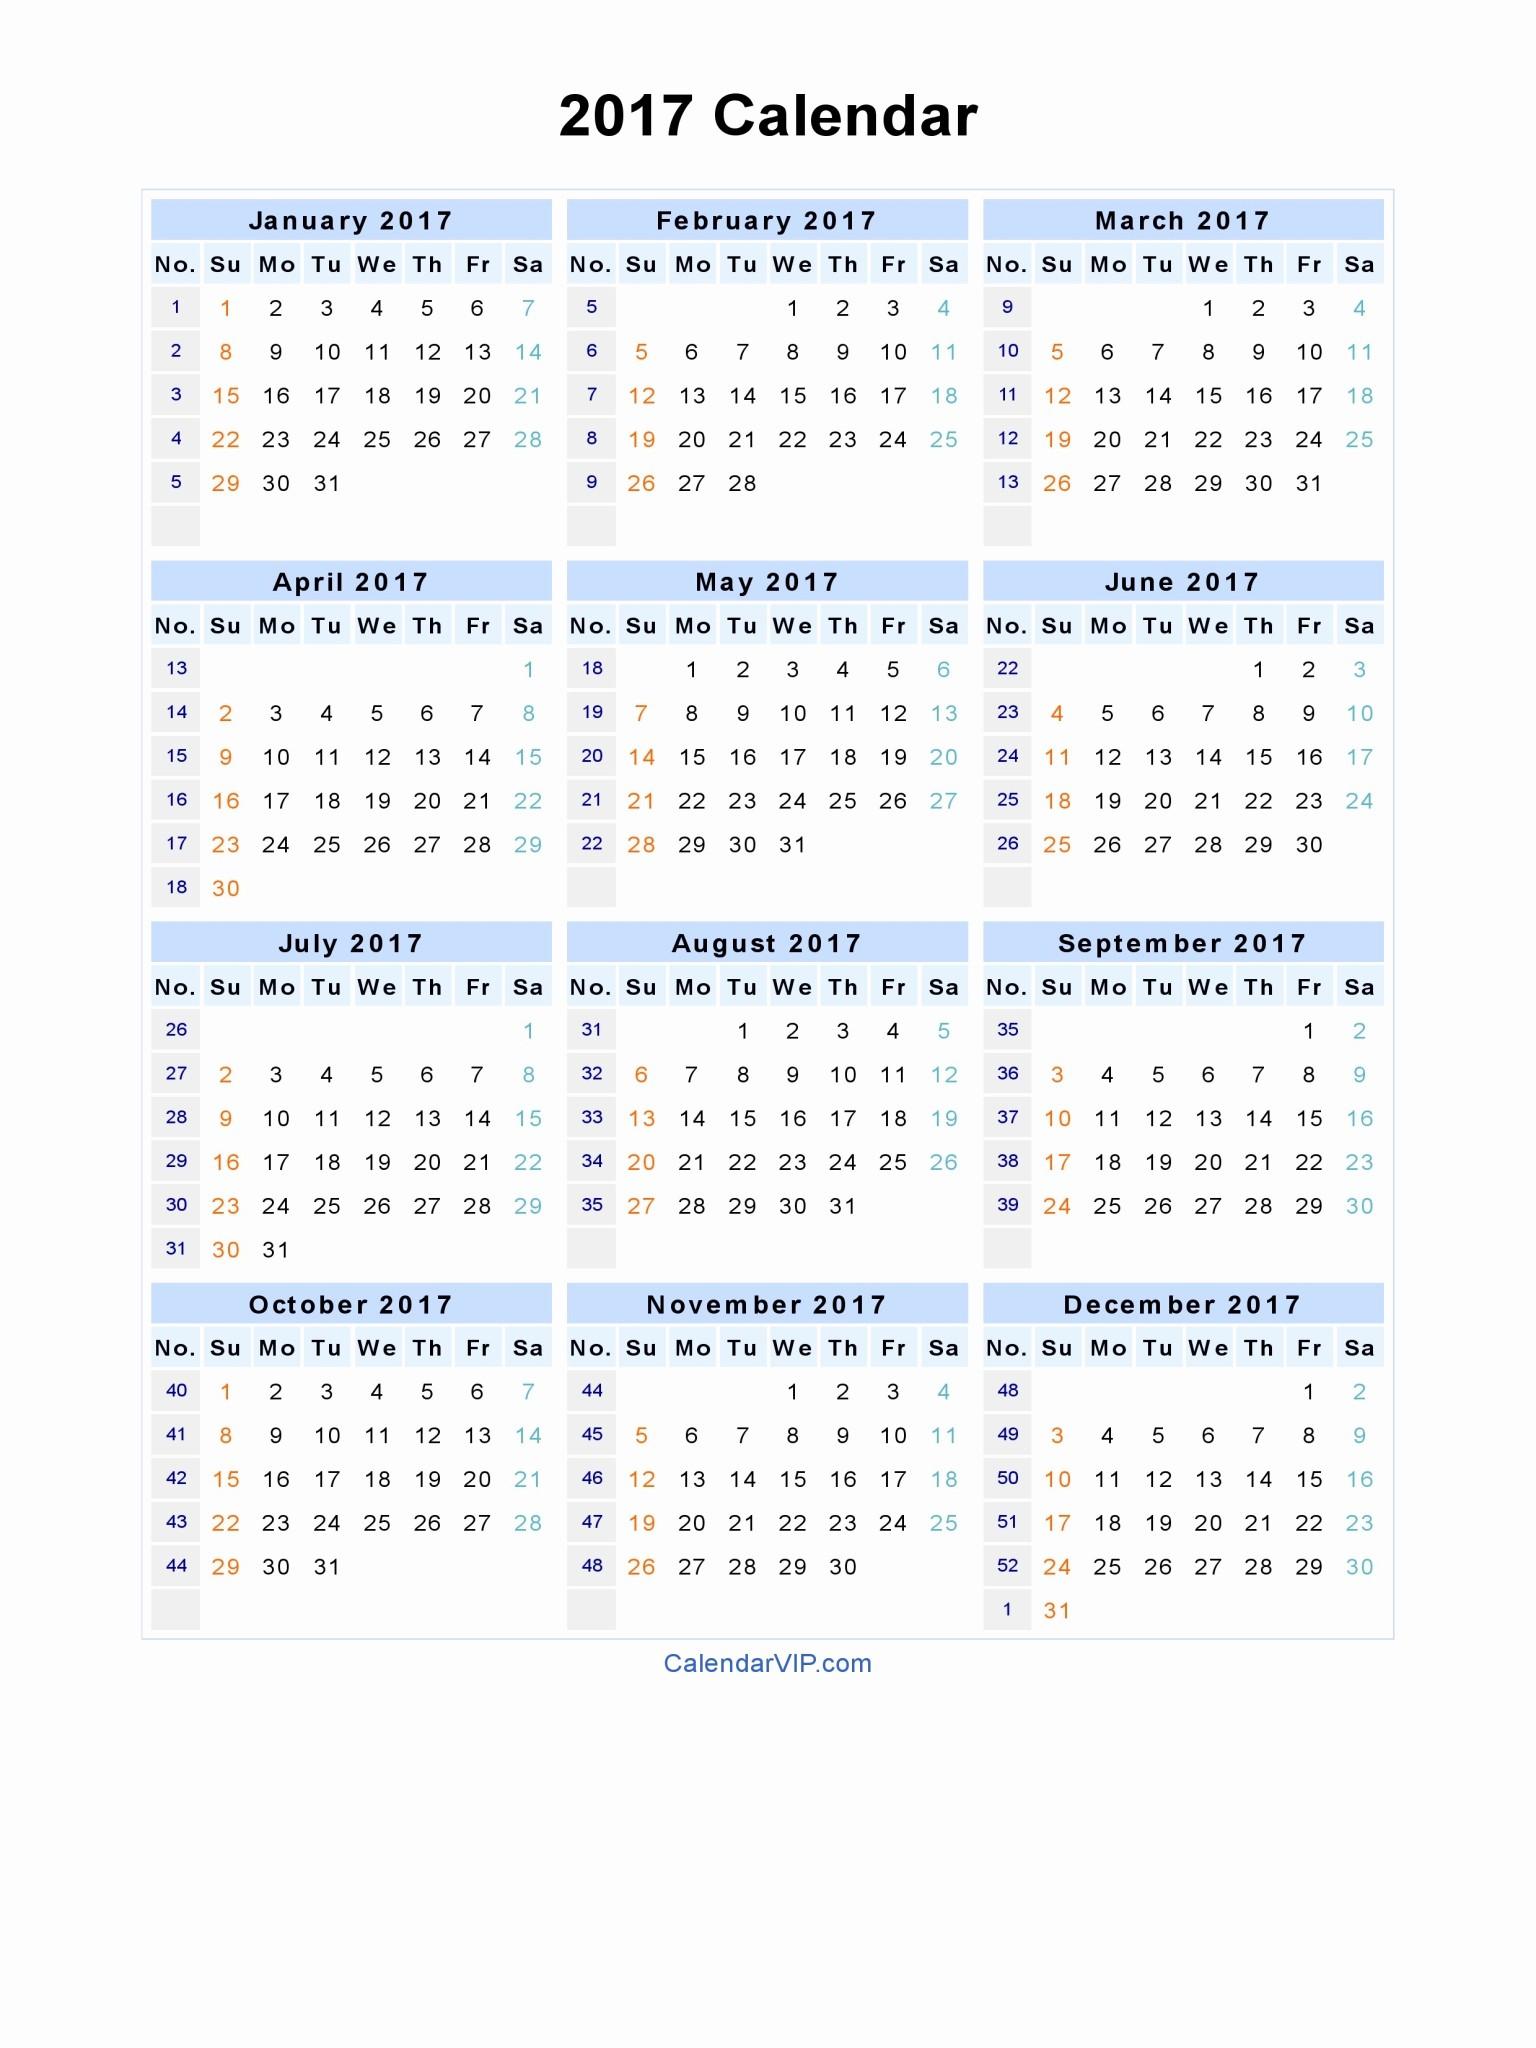 2017 Year Calendar Printable Free Inspirational 2017 Printable Calendar Word